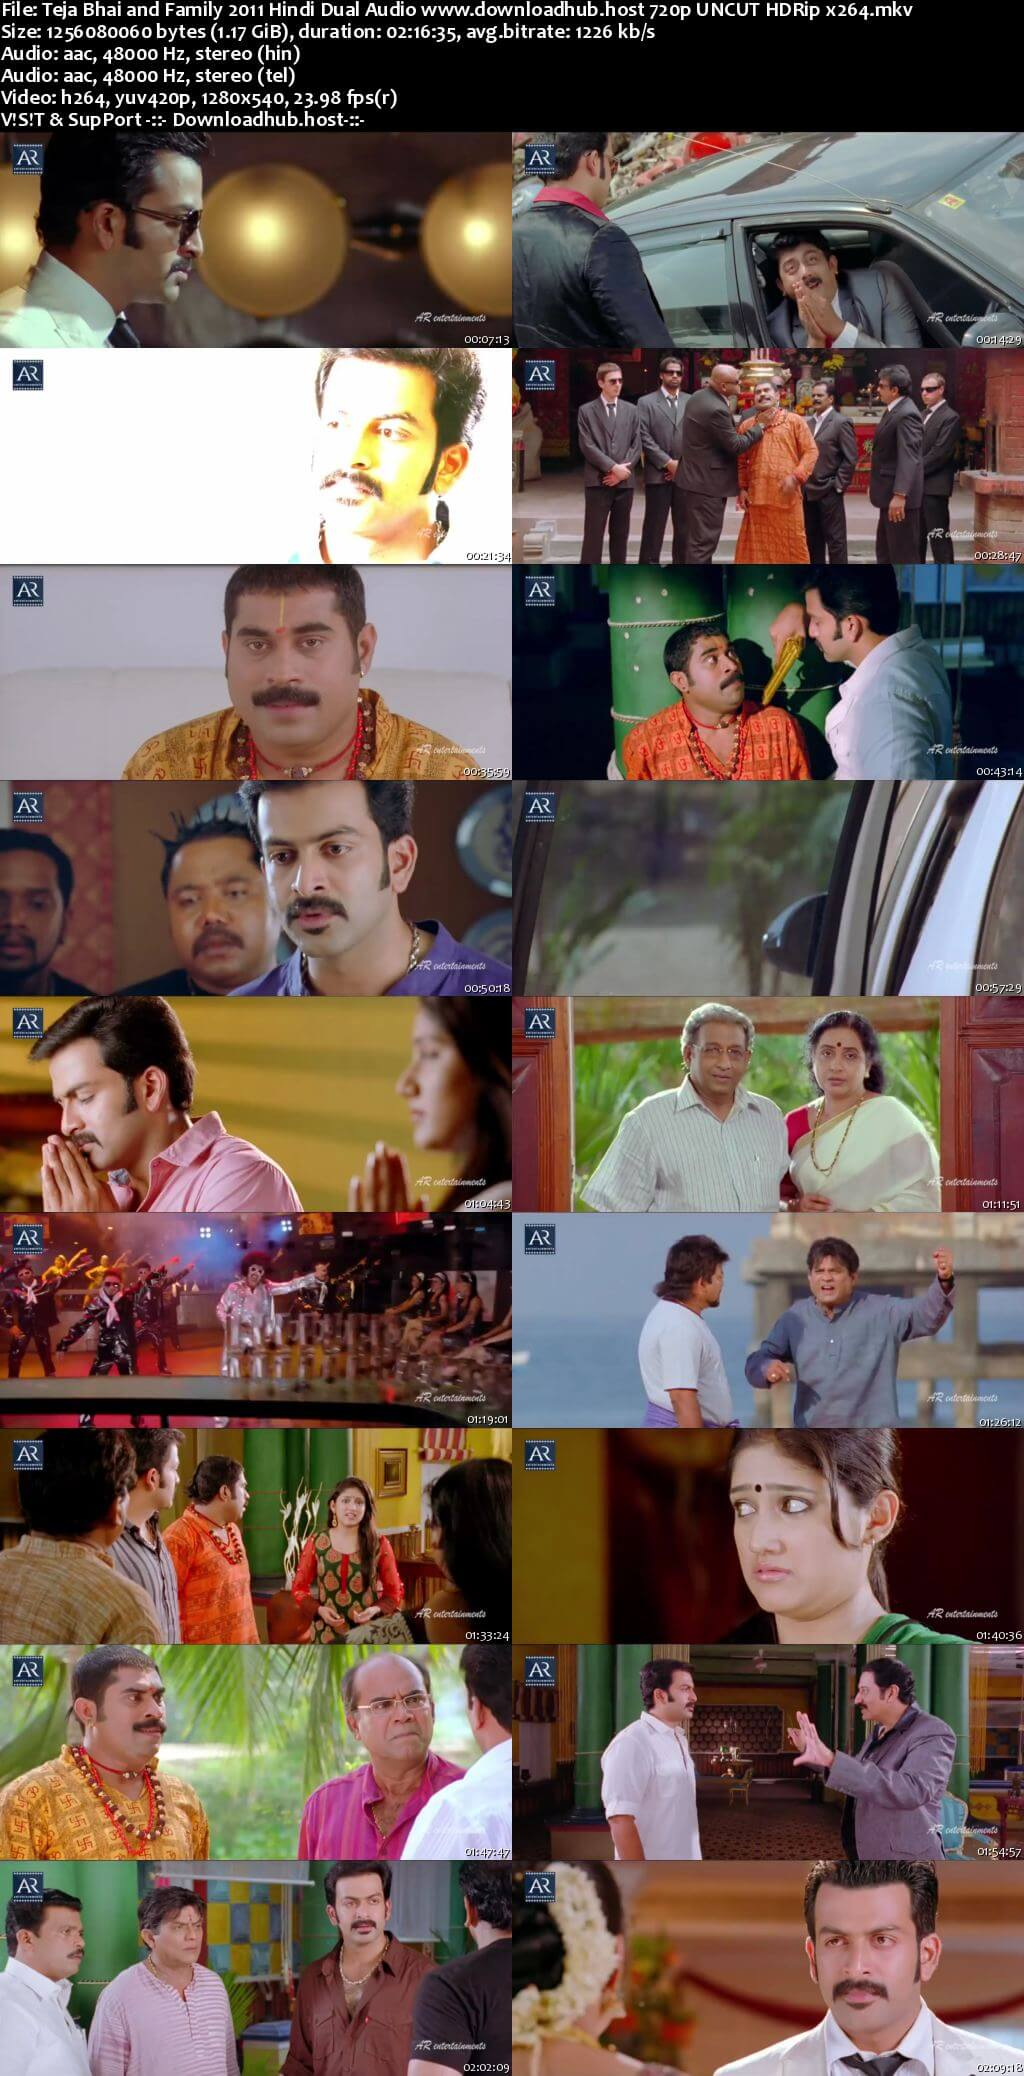 Teja Bhai and Family 2011 Hindi Dual Audio 720p UNCUT HDRip x264